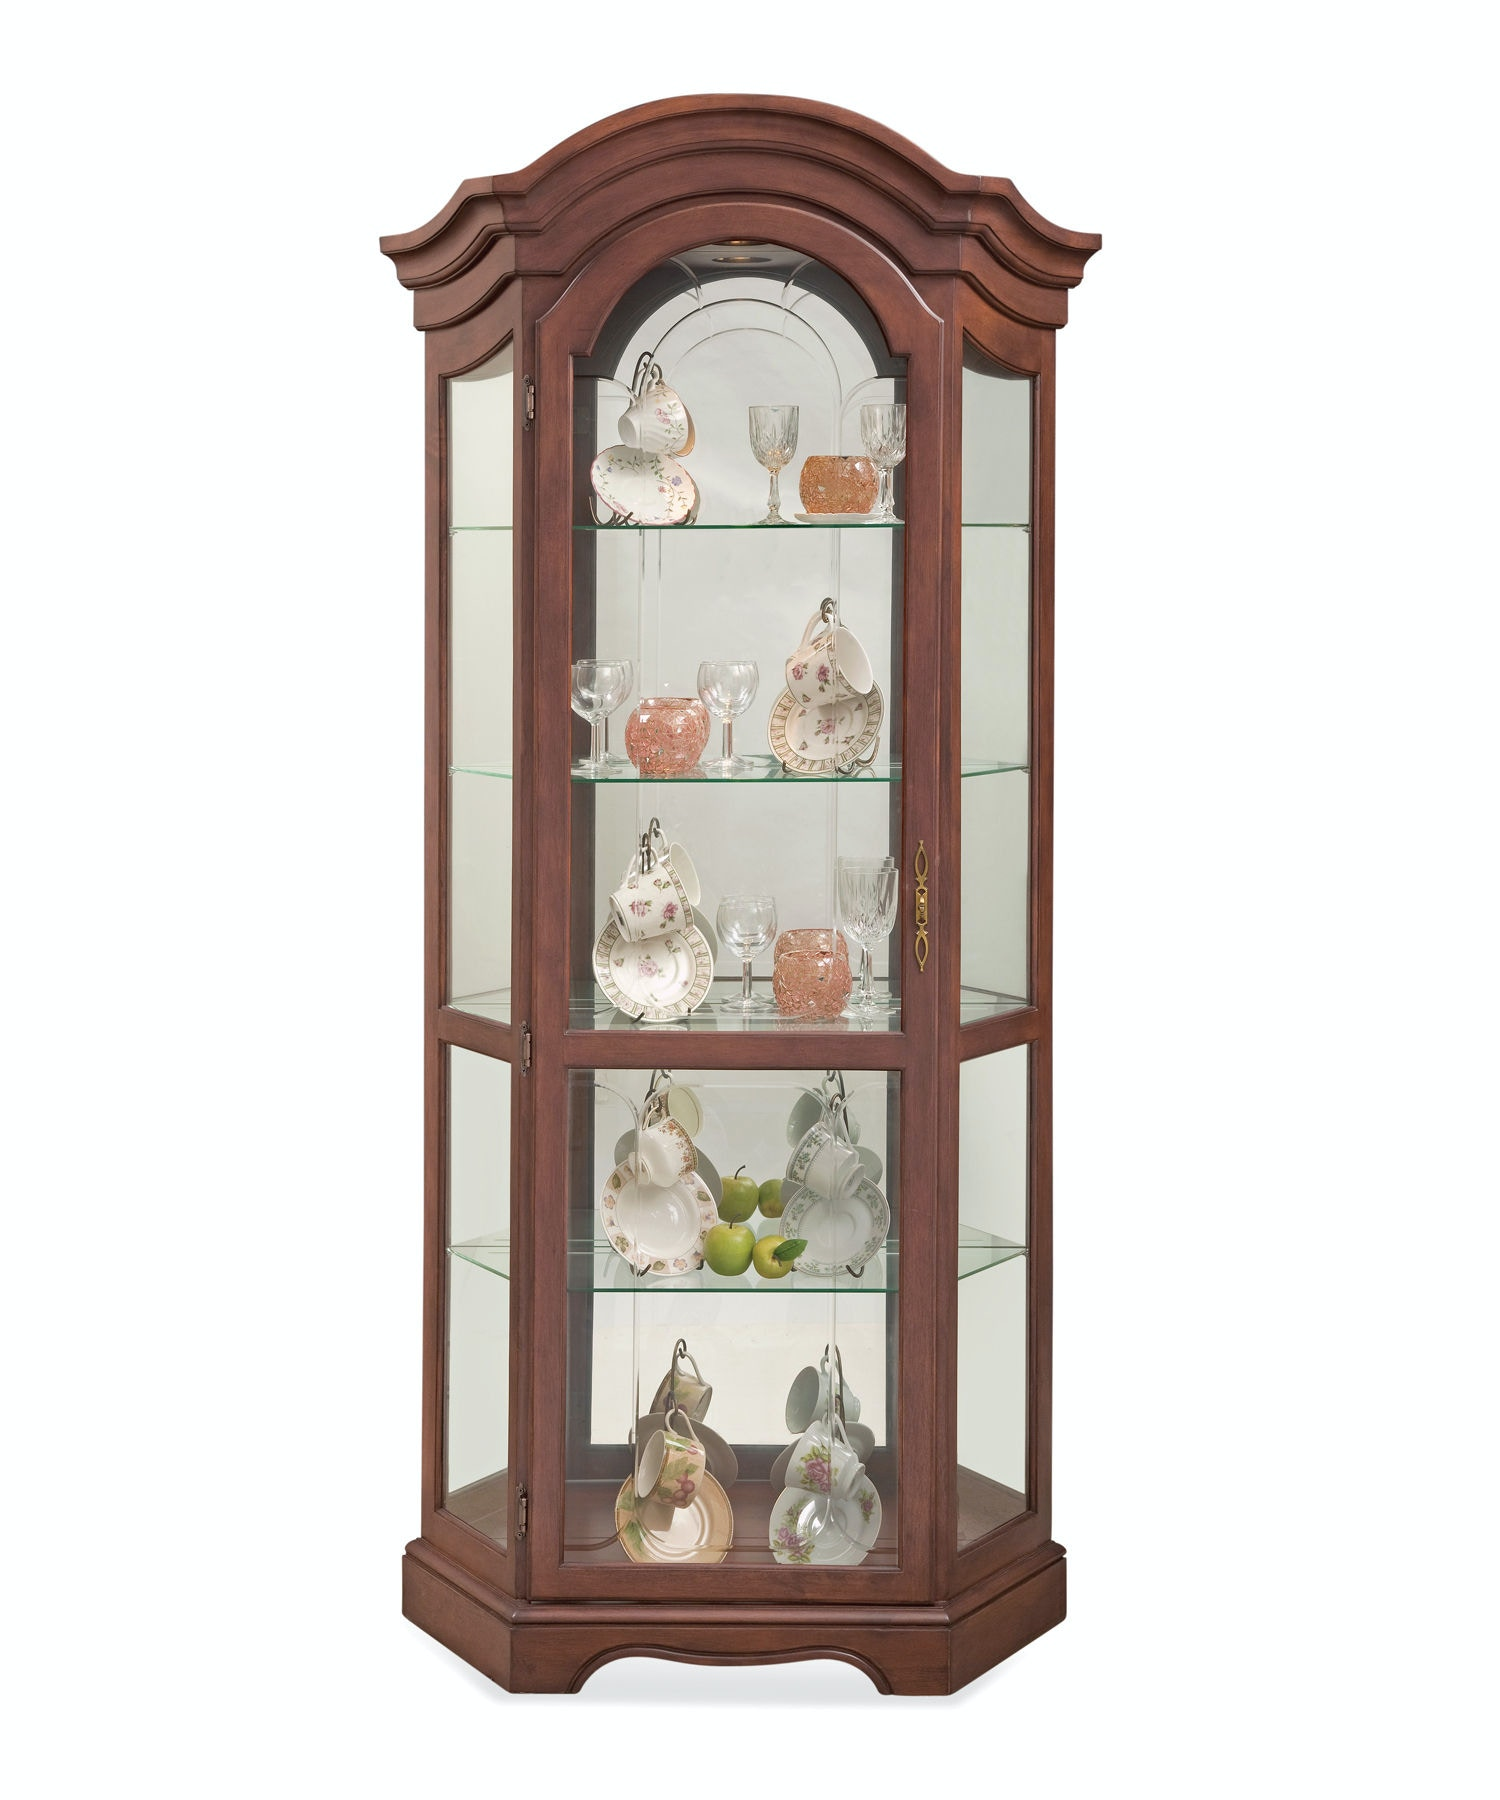 Philip Reinisch Living Room Stafford Curio Cabinet